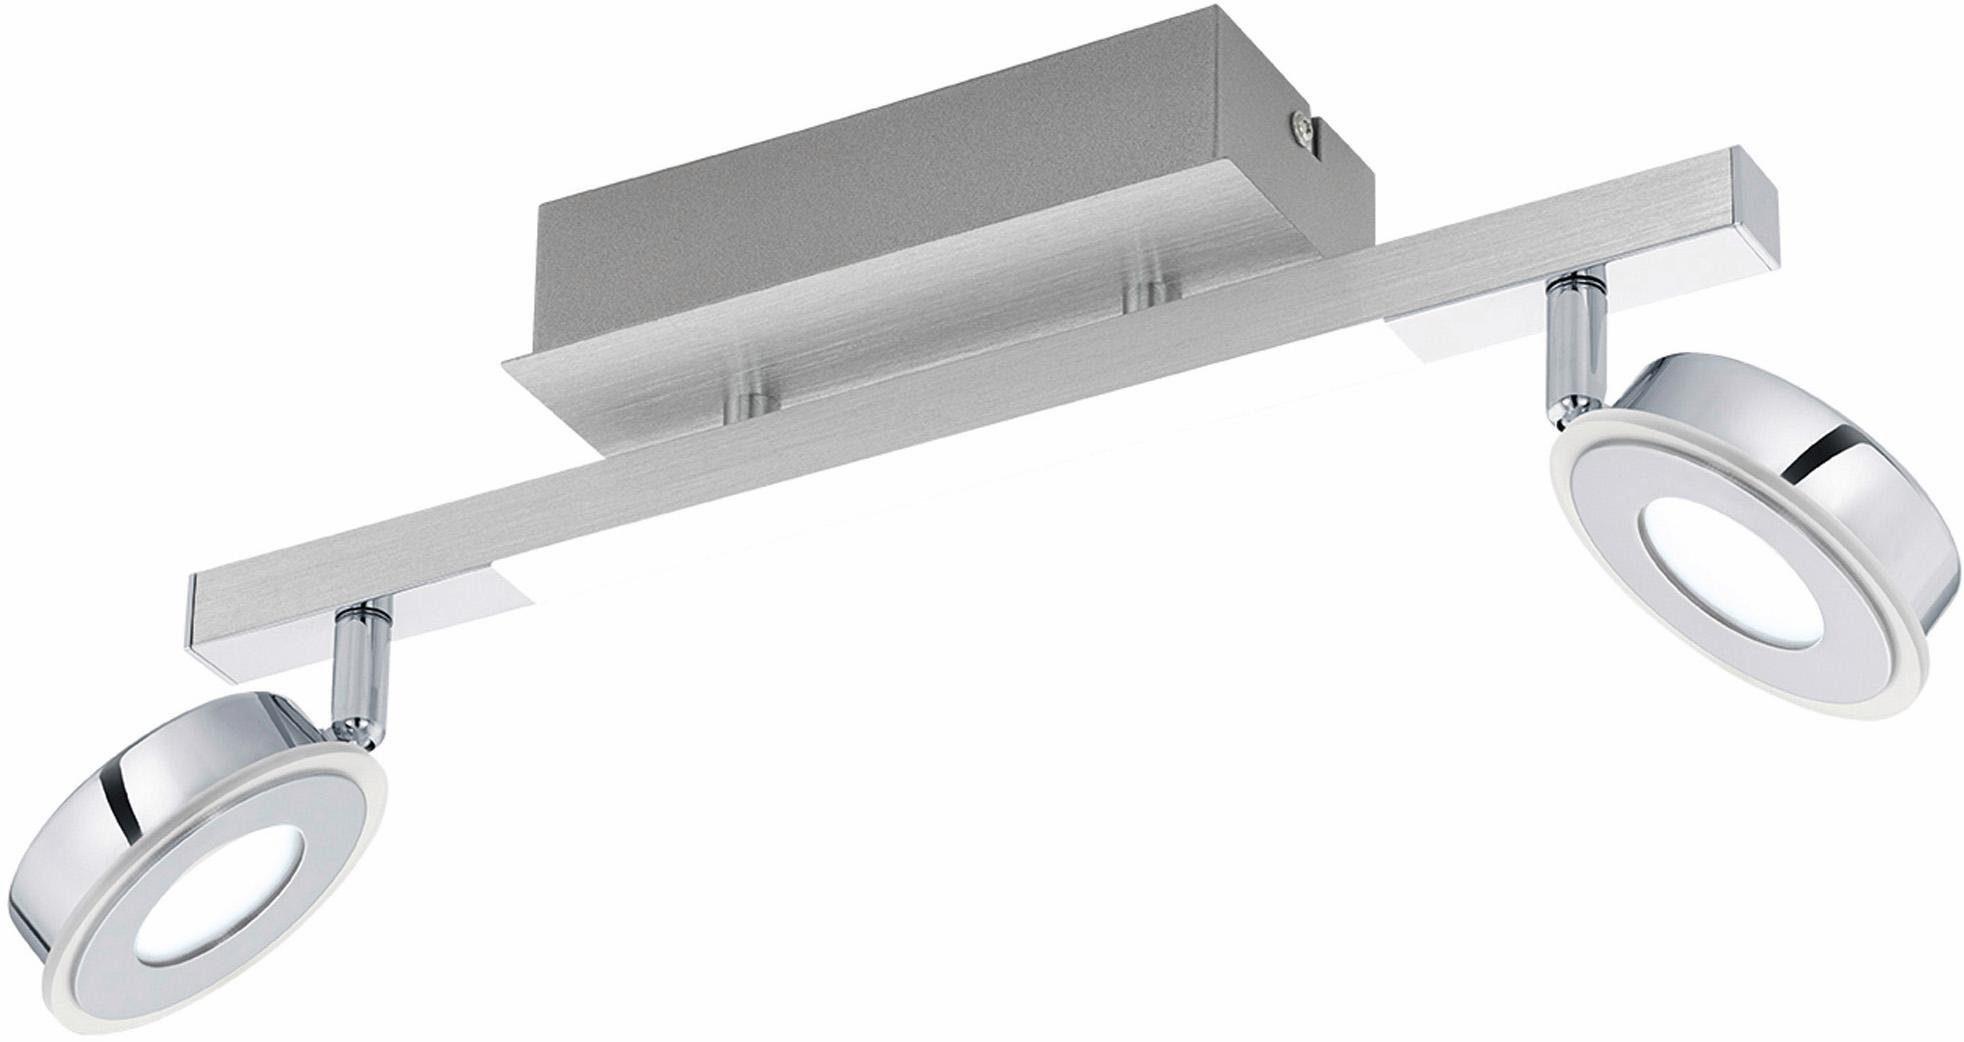 EGLO LED Deckenstrahler »CARDILLIO«, 3-flammig